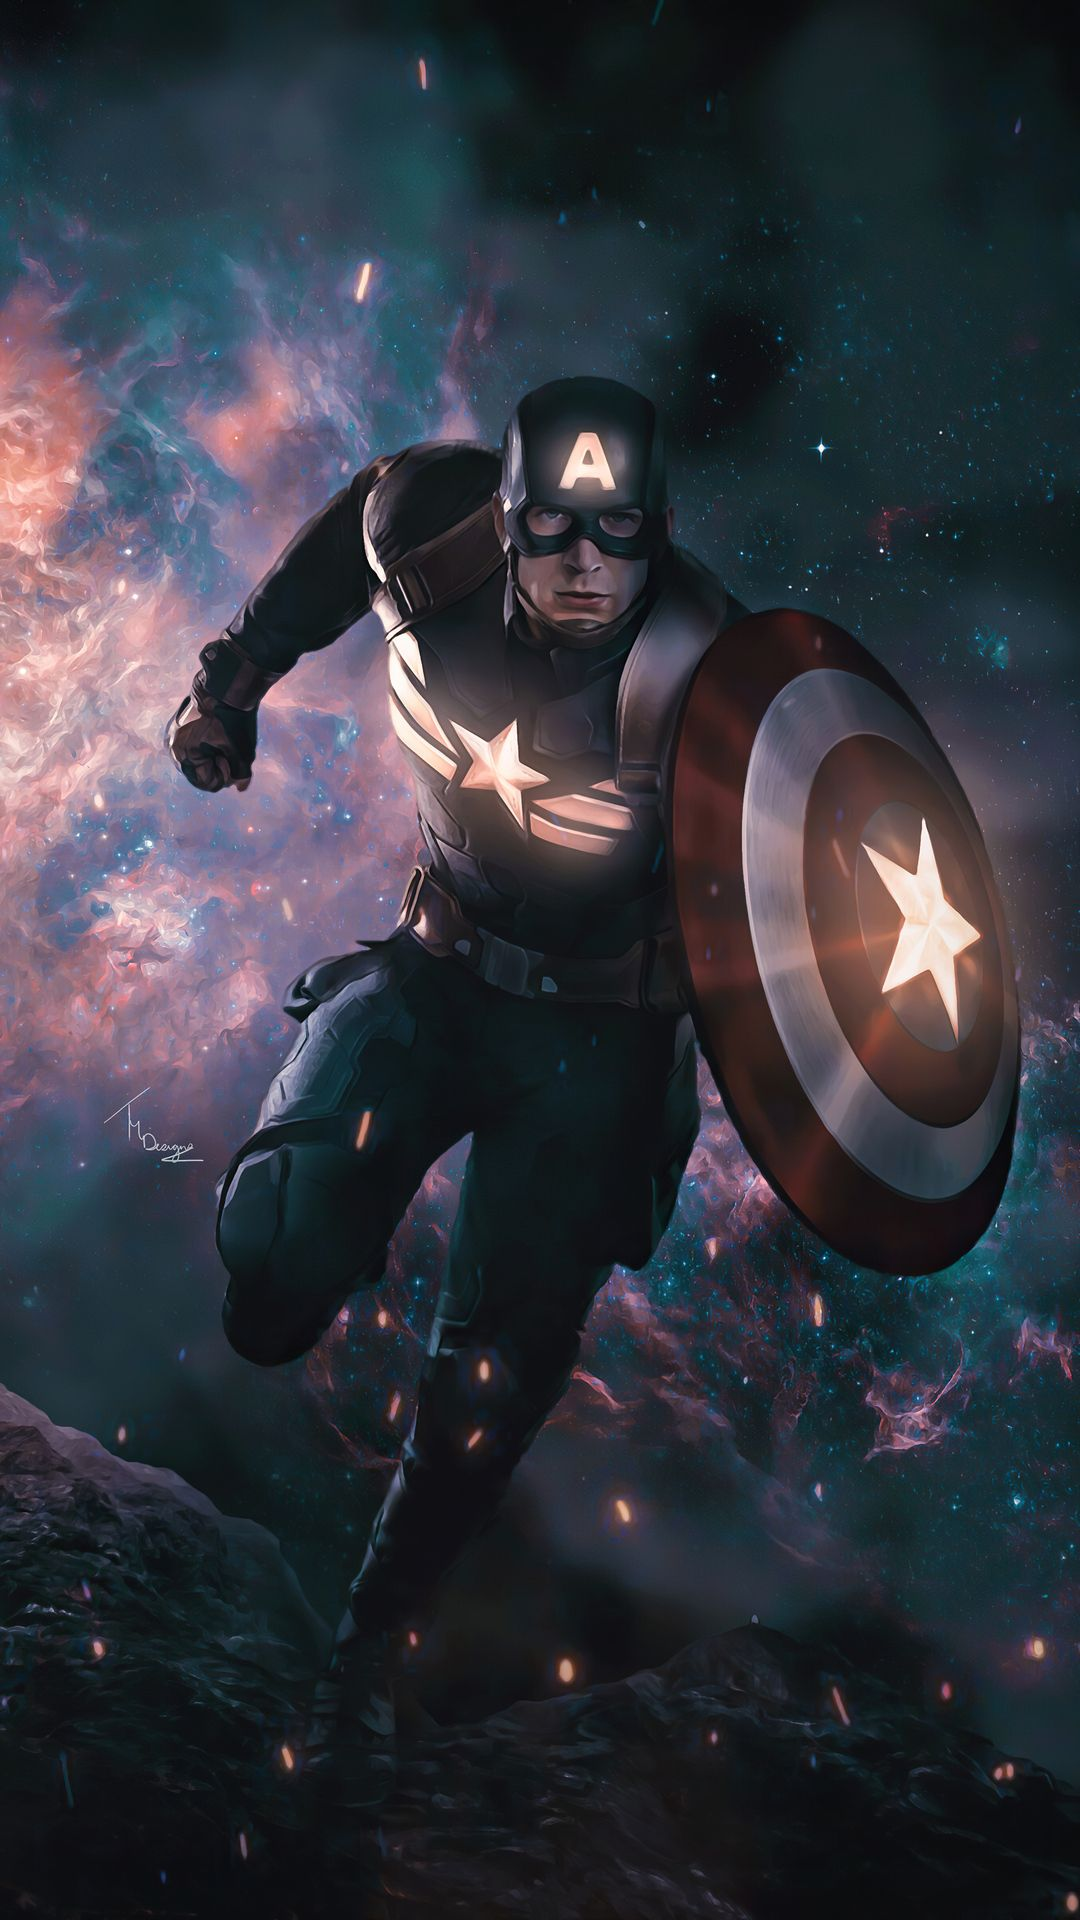 2020 Captain America 4k Artwork In 1080x1920 Resolution Captain America Artwork Captain America Wallpaper Captain America Images